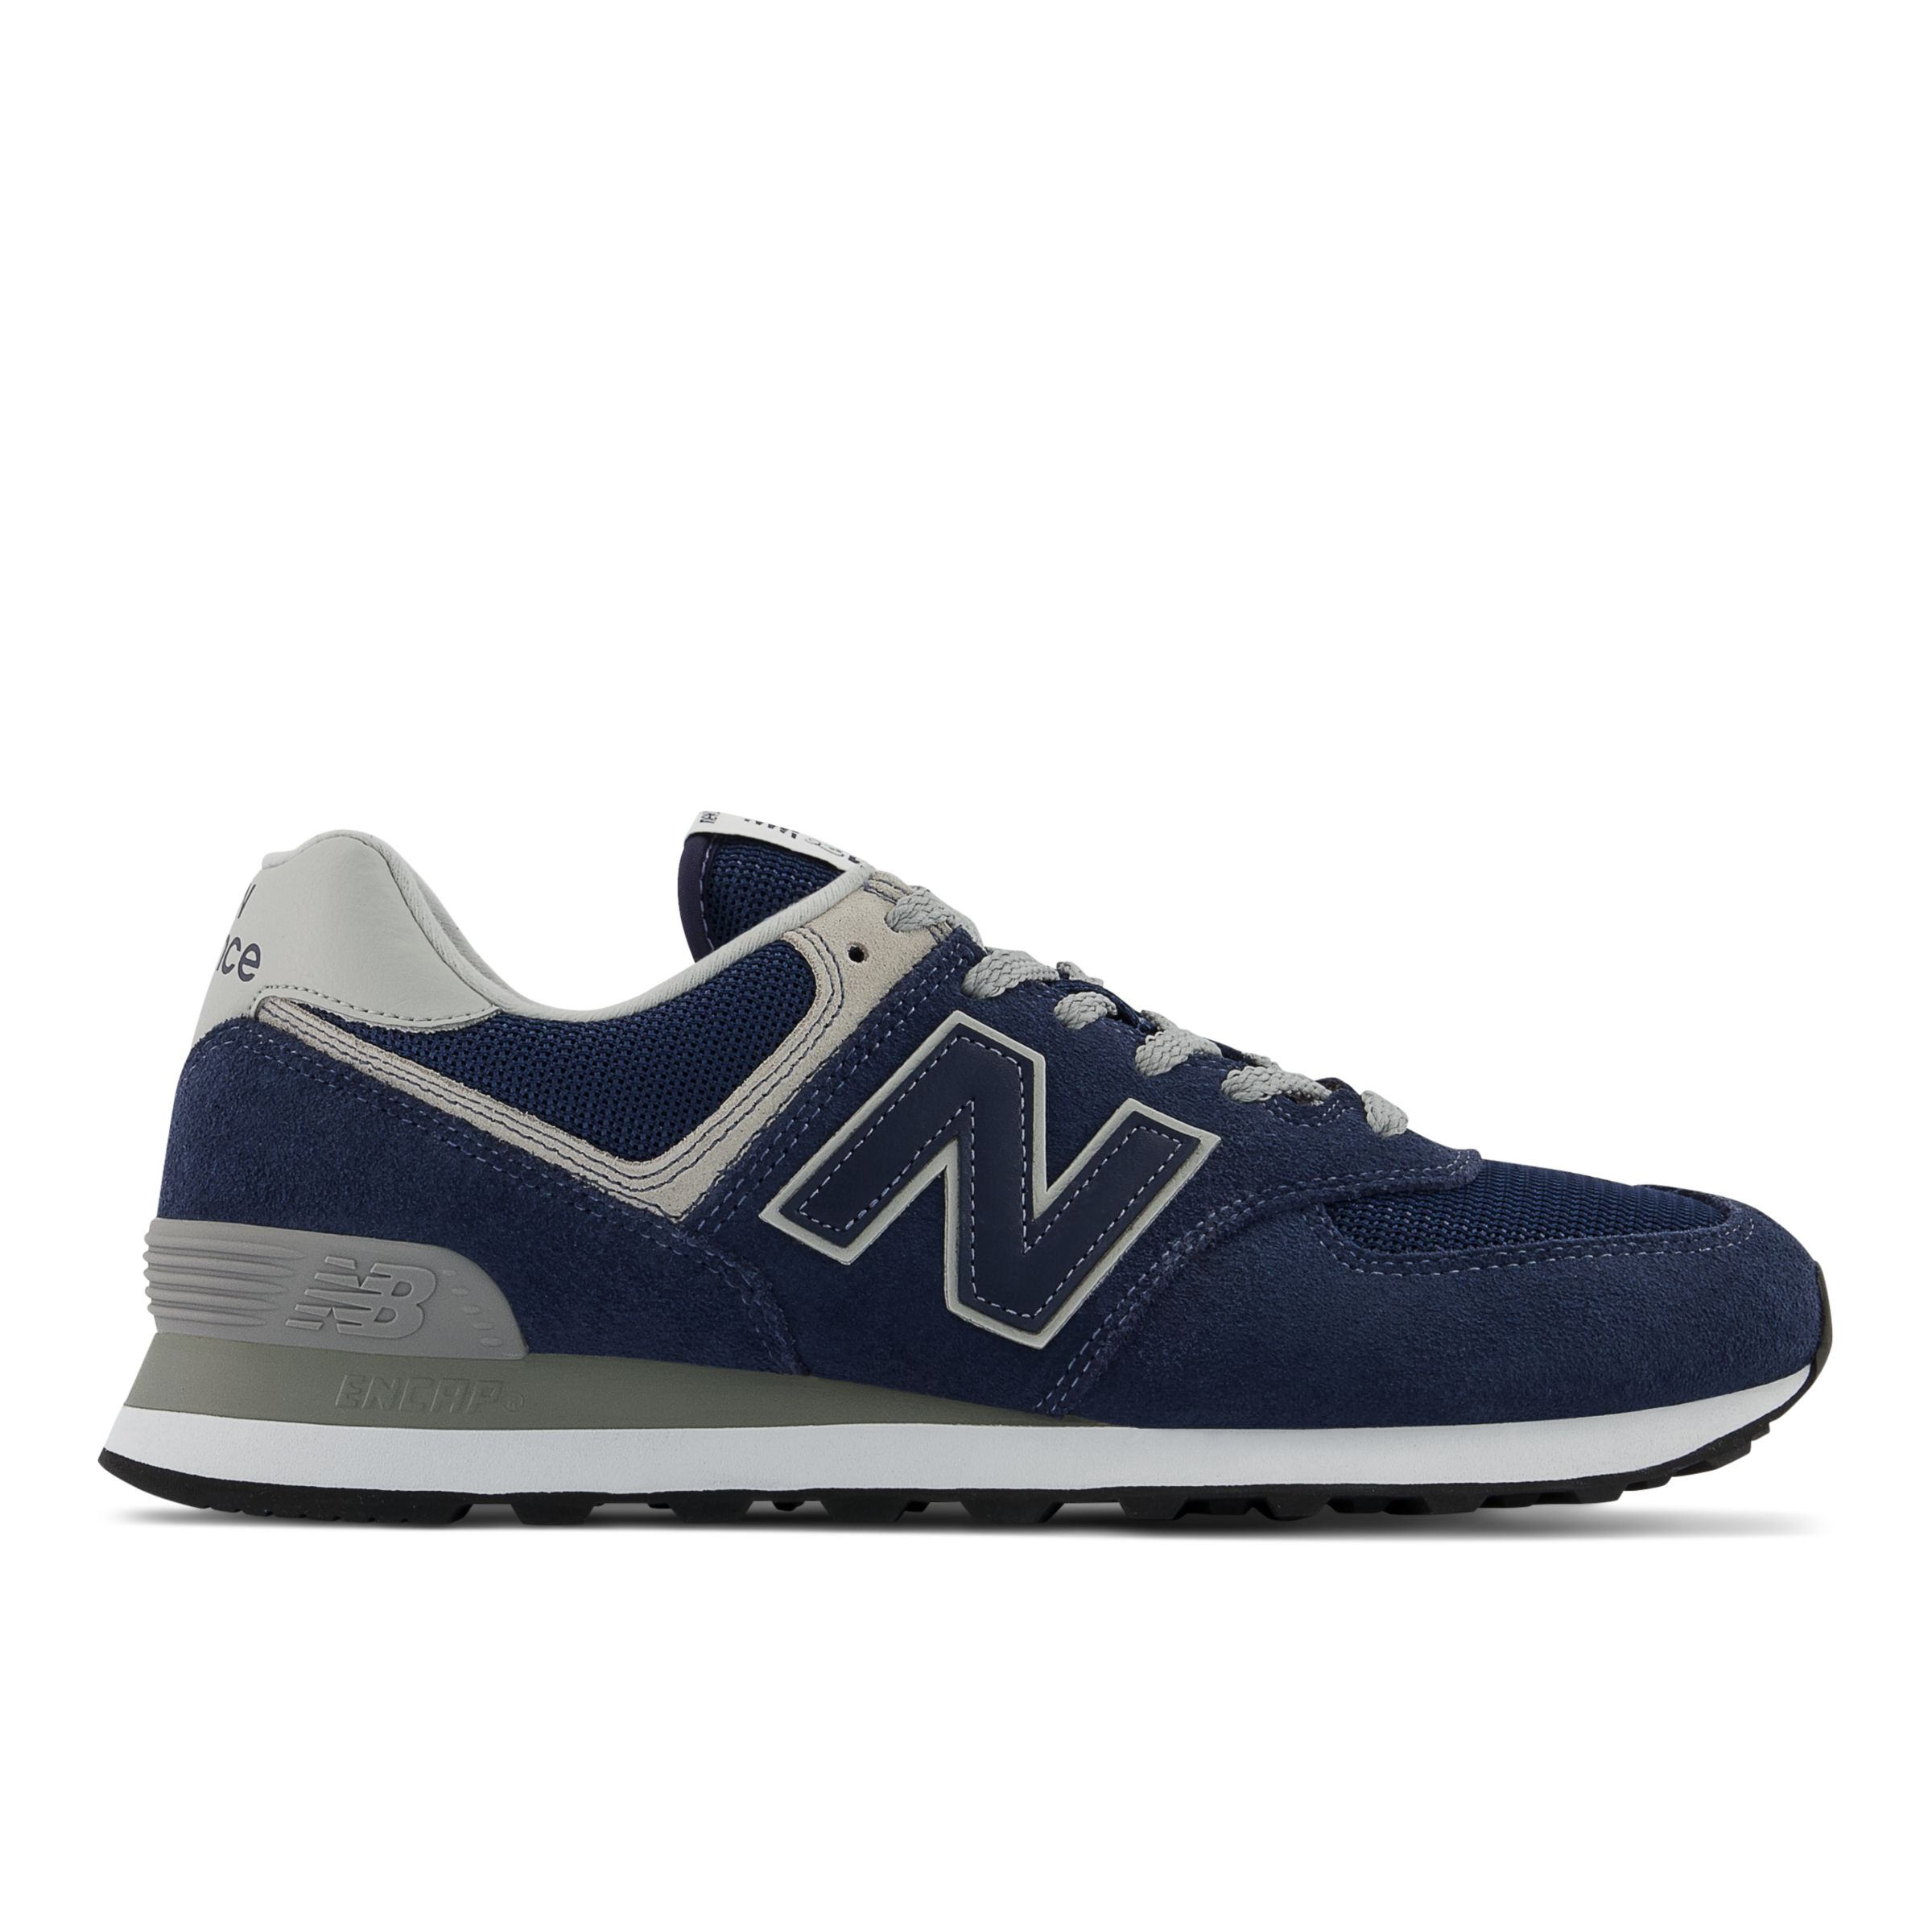 574 sport rh newbalance com